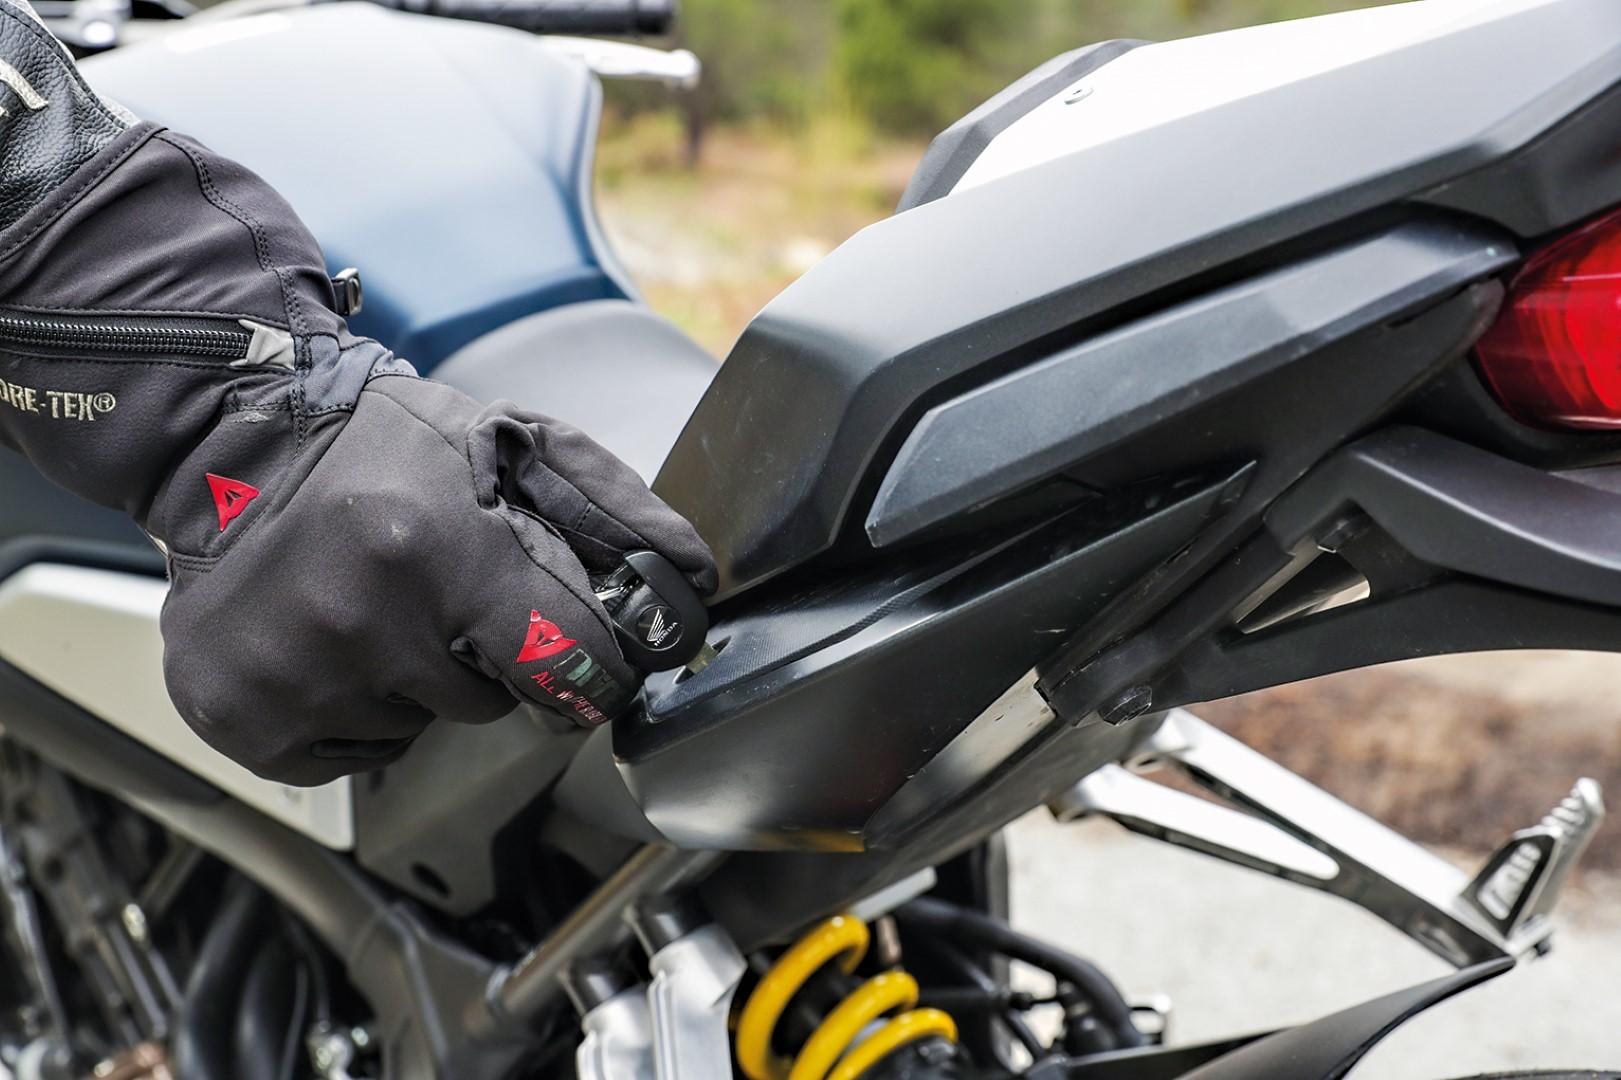 Superprueba de la Honda CB650R